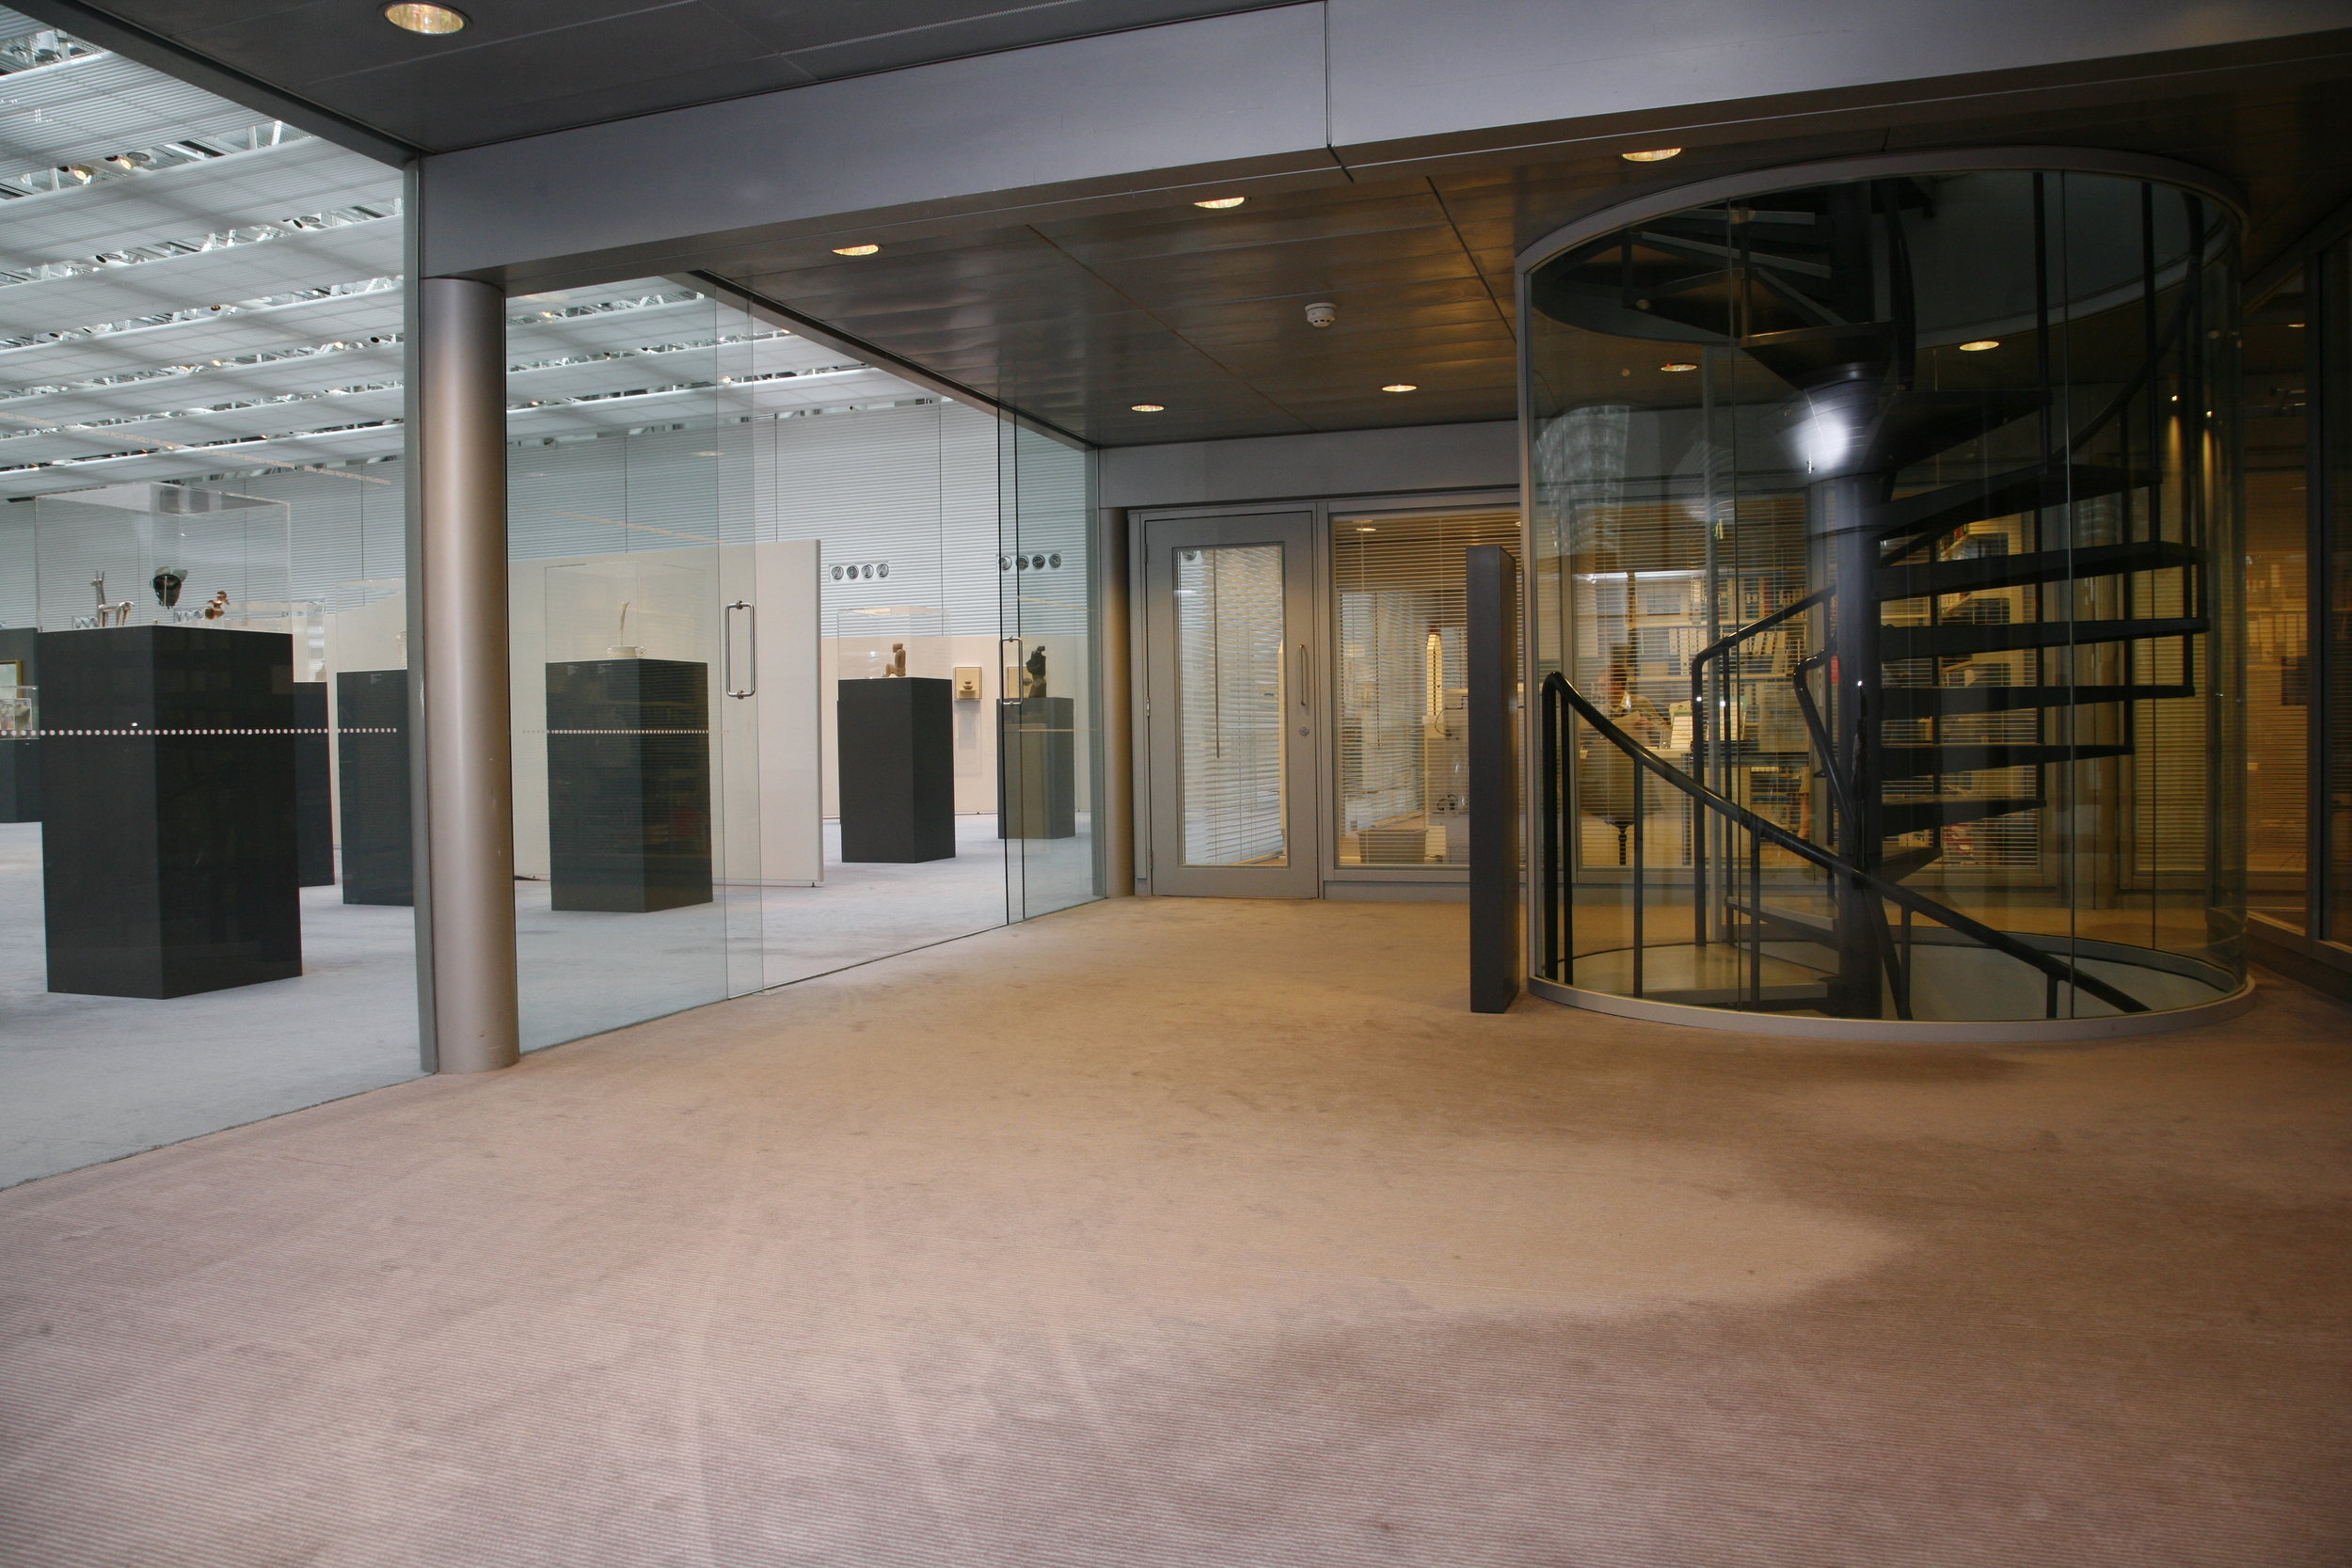 SAInSBURY'S centre for visual arts case study -